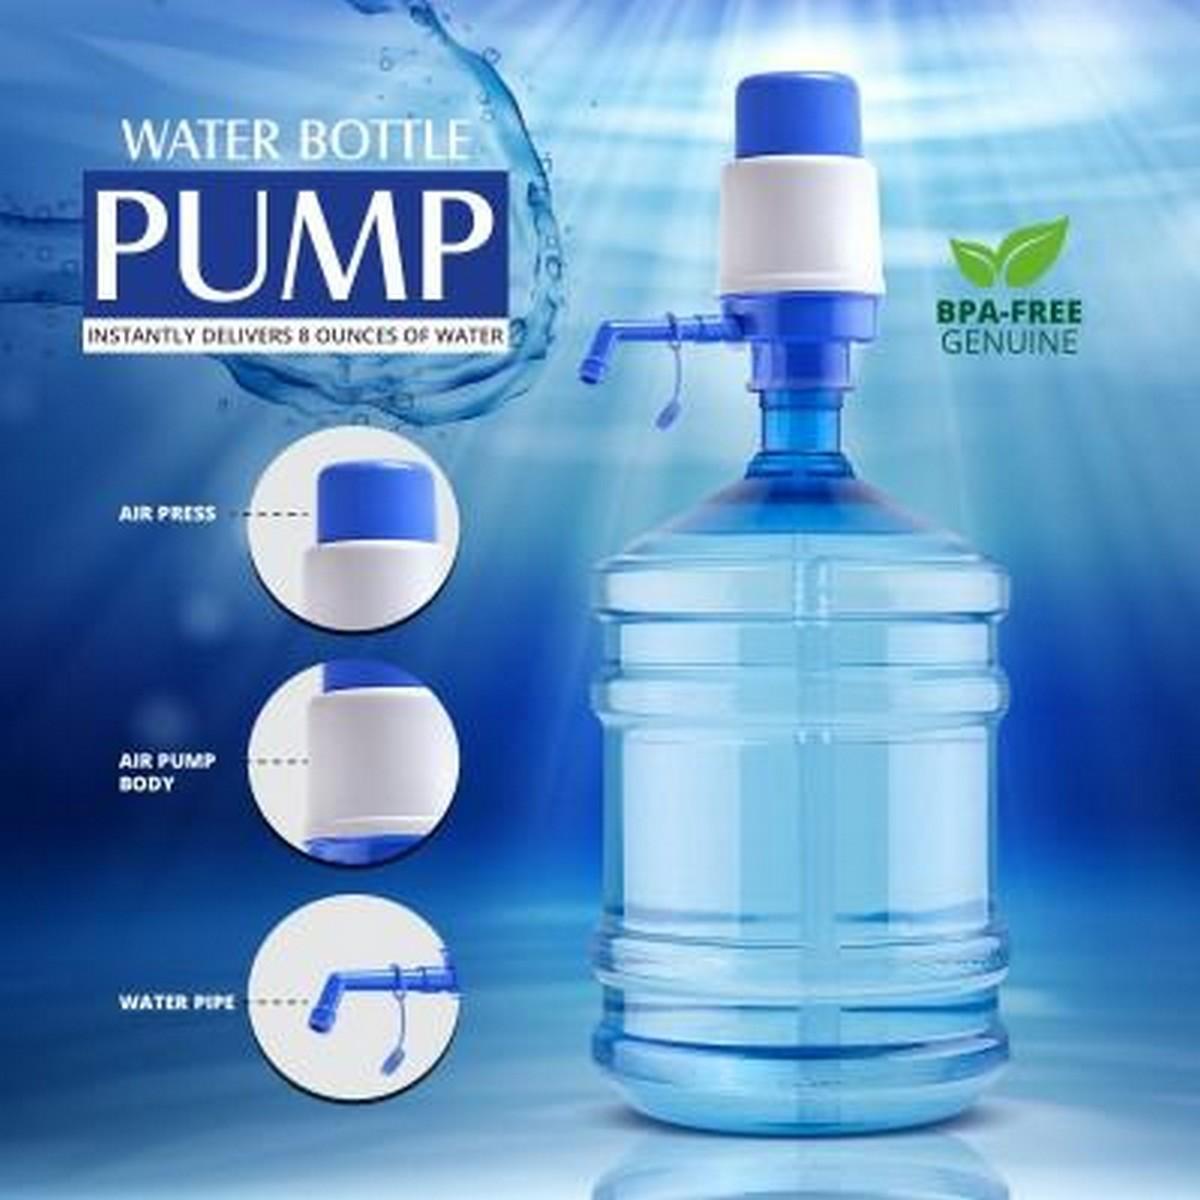 Water Bottle Dispenser manual pump 19 / 20 L